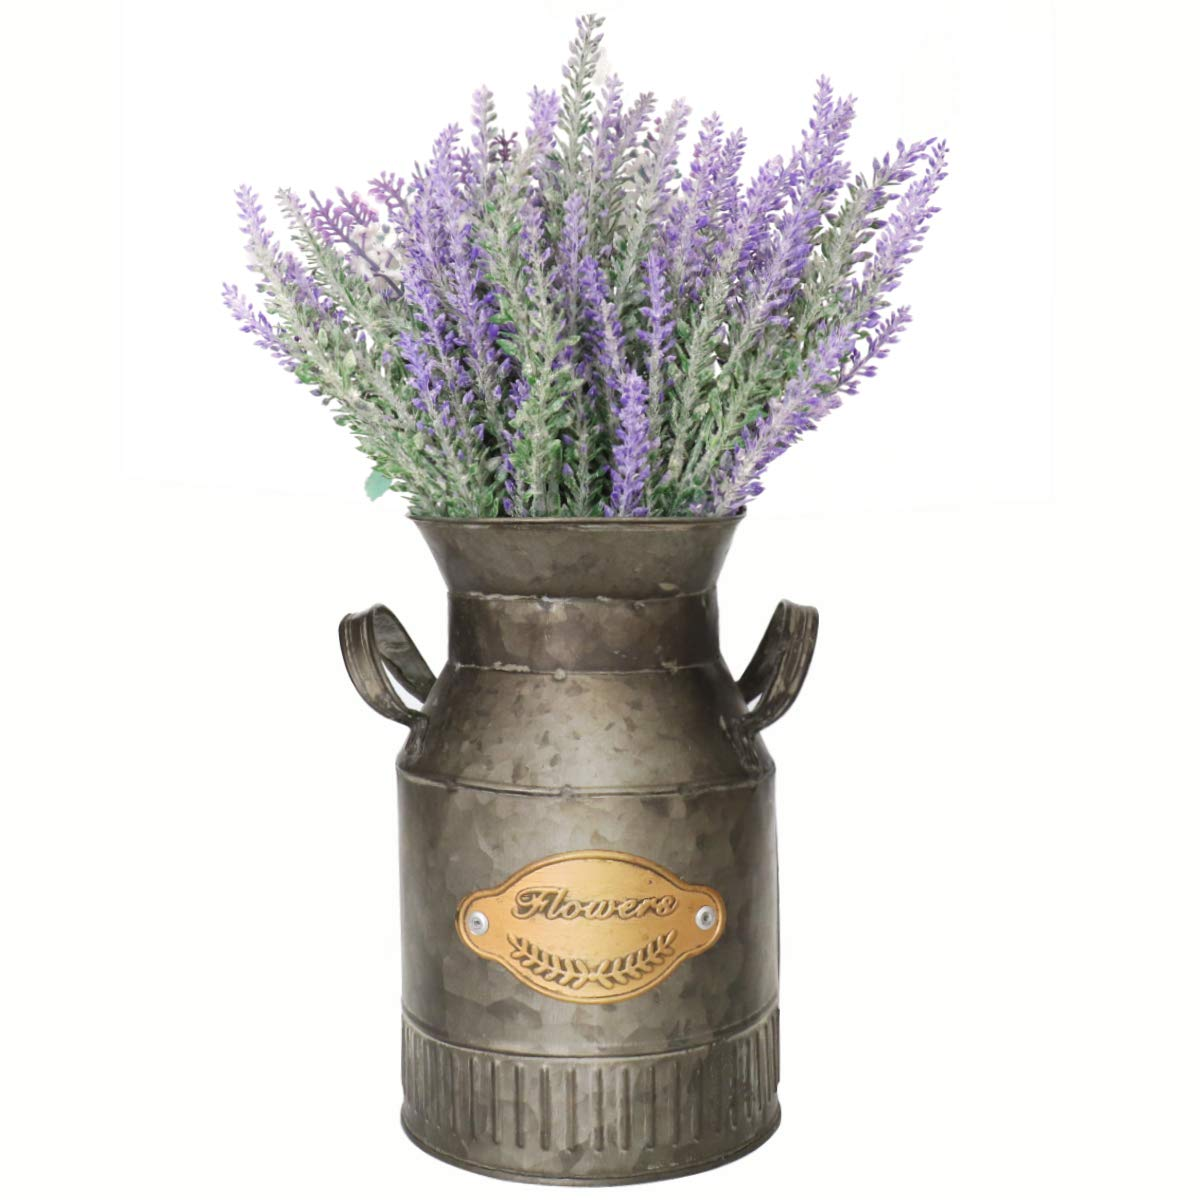 VANCORE Shabby Chic Metal Jug Galvanized Pitcher Milk Jug Vase Farmhouse Decor for The Home